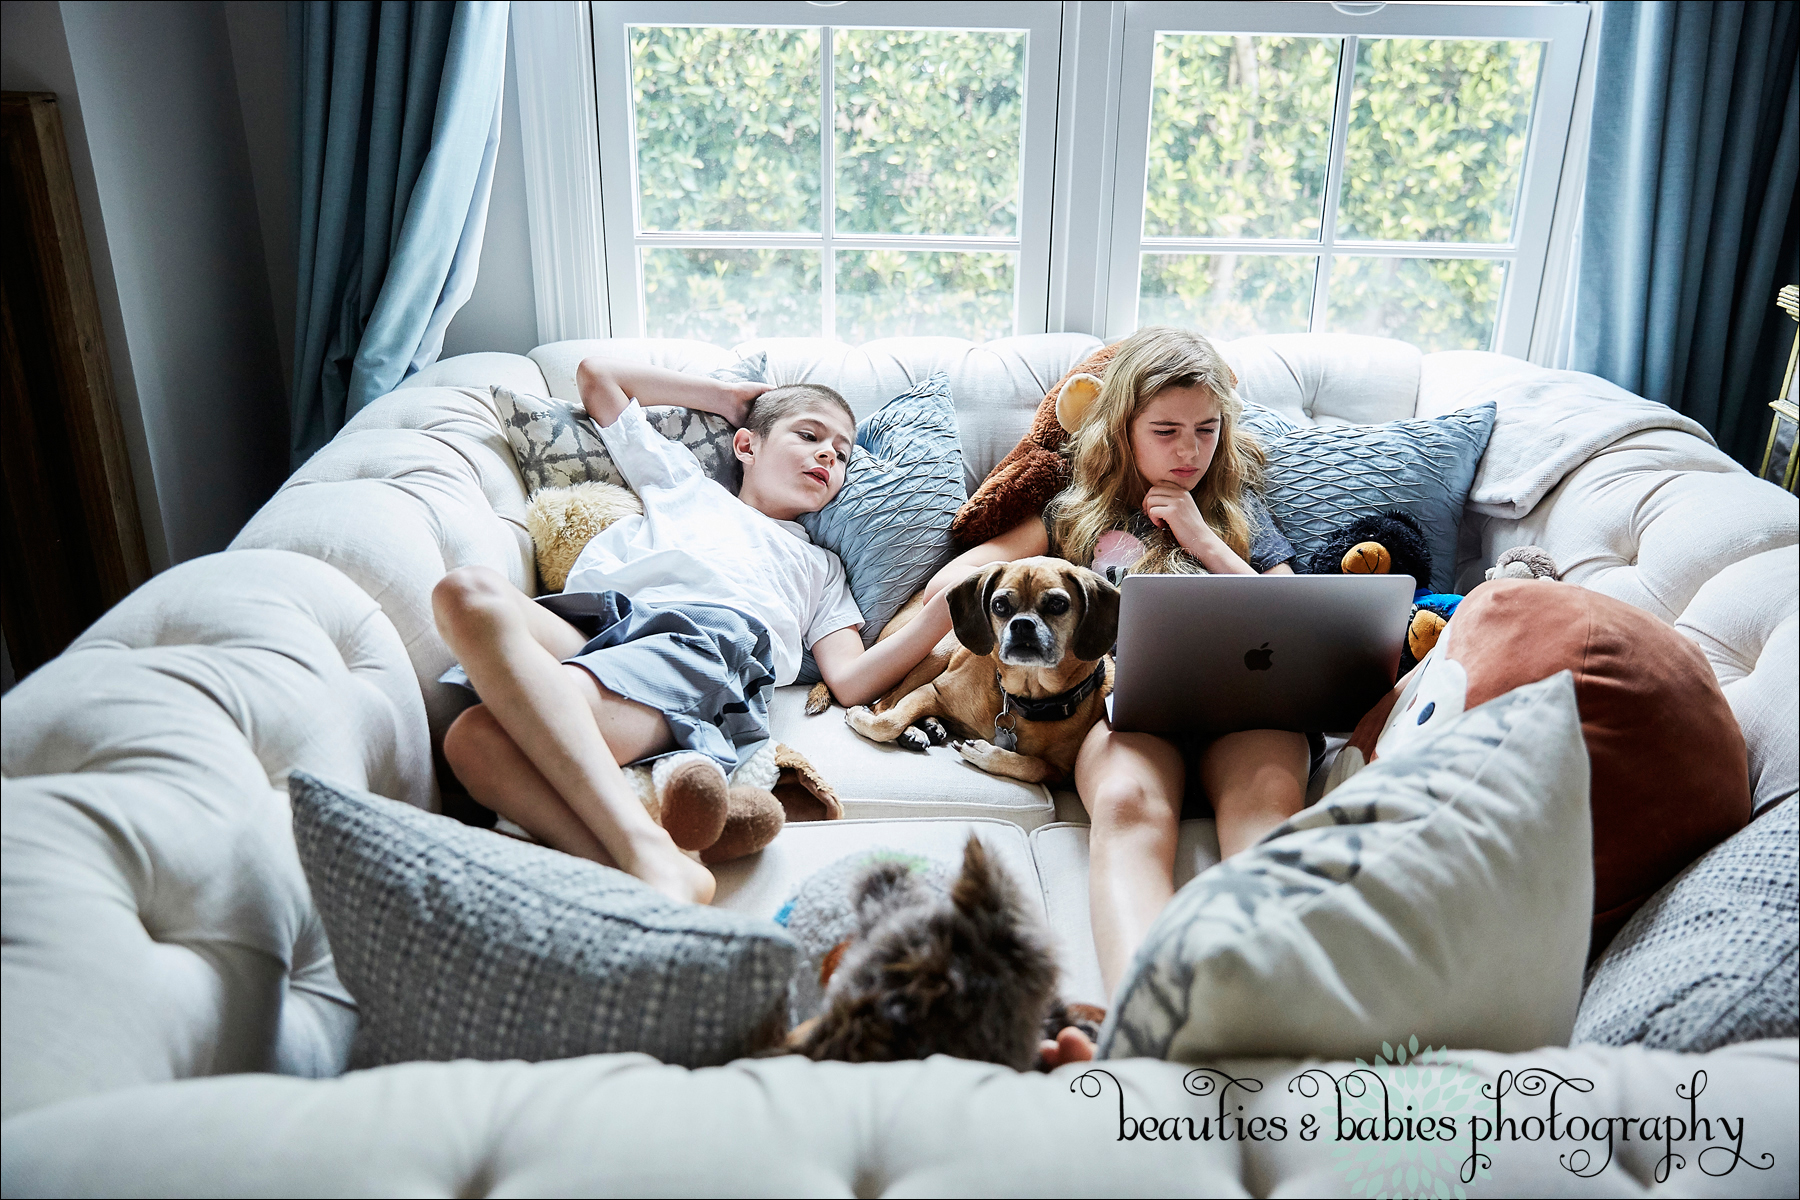 At home family photography coronavirus quarantine life